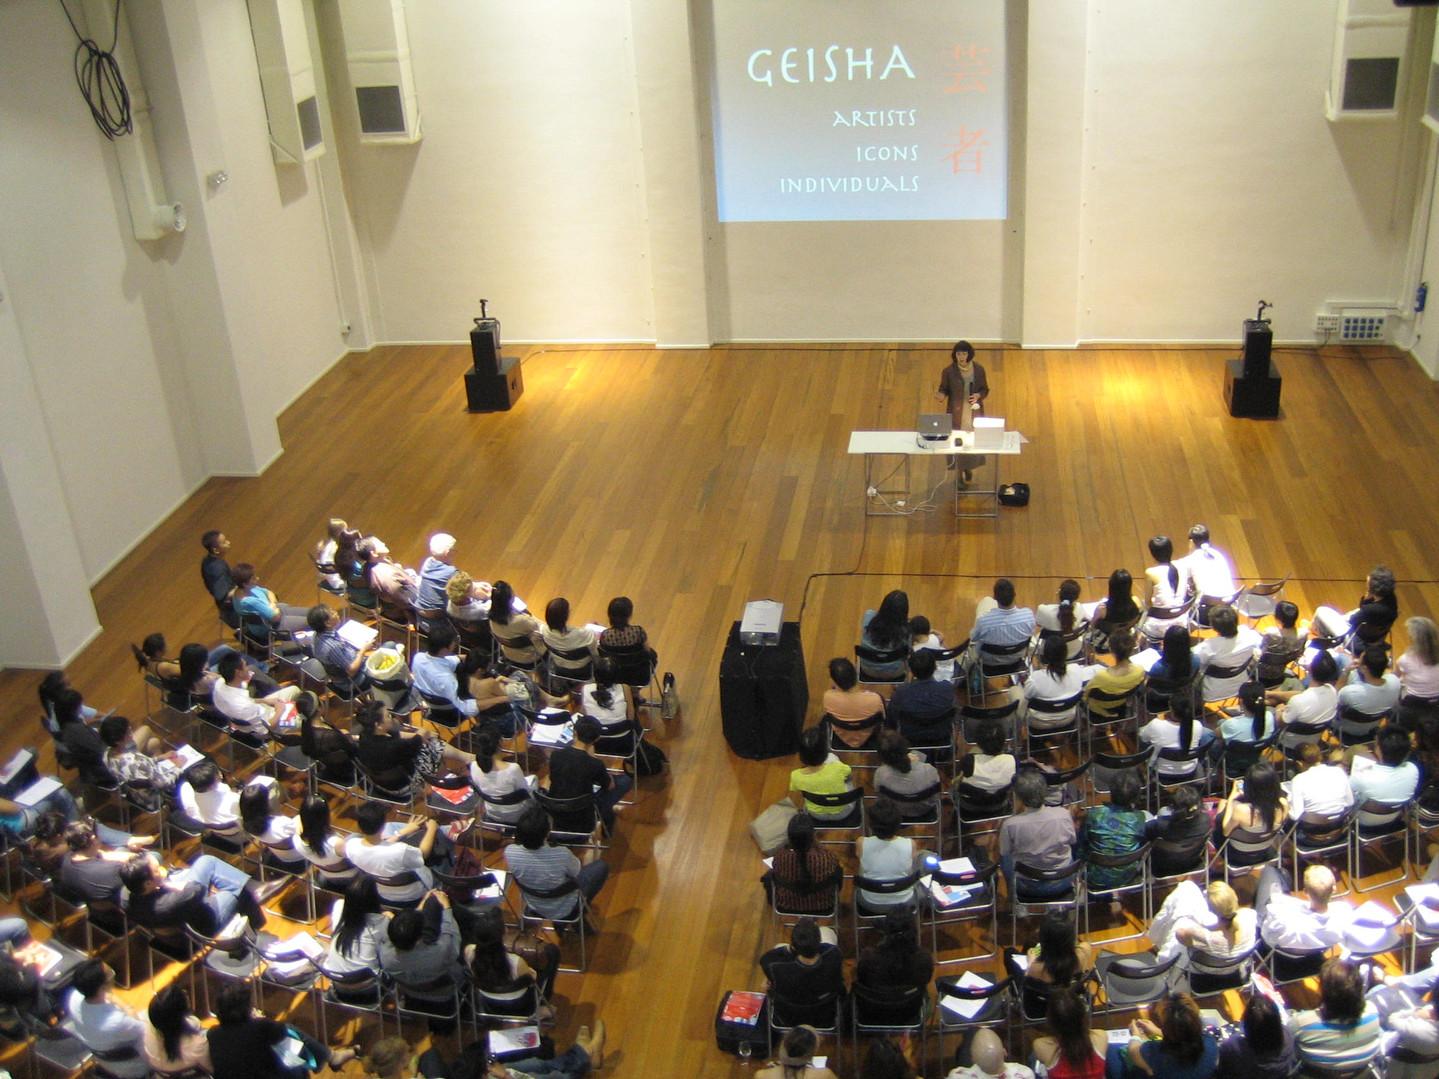 The Making of a Geisha -  Talk by Liza Dalby